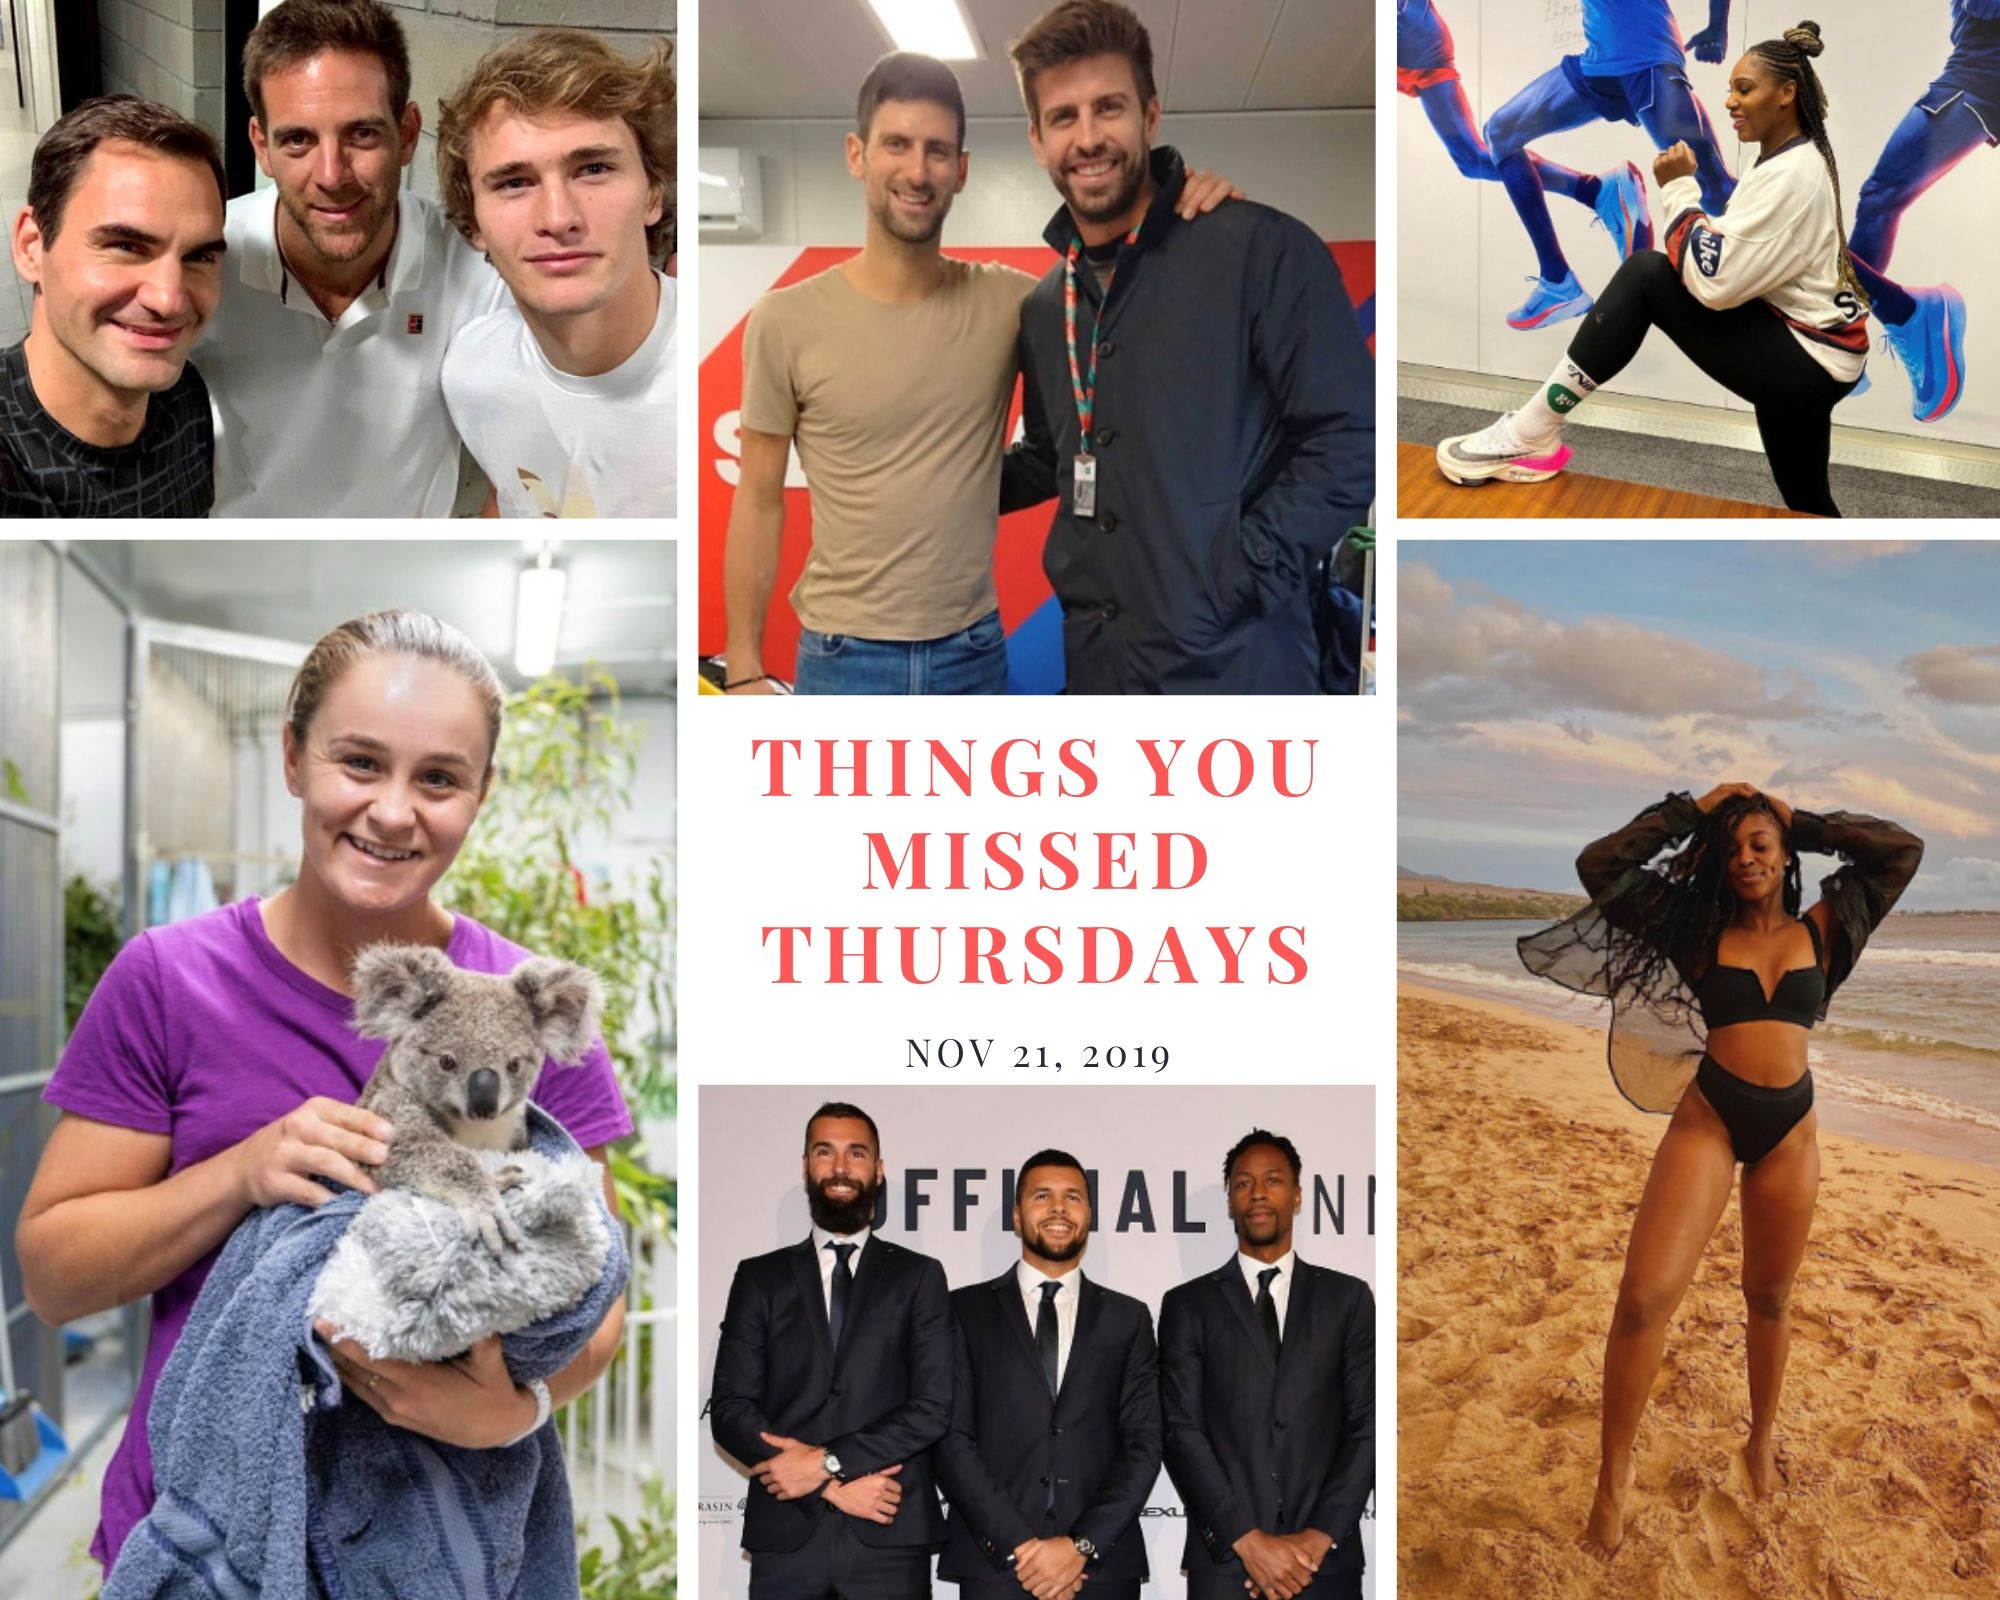 Things You Missed Thursdays – Nov 21